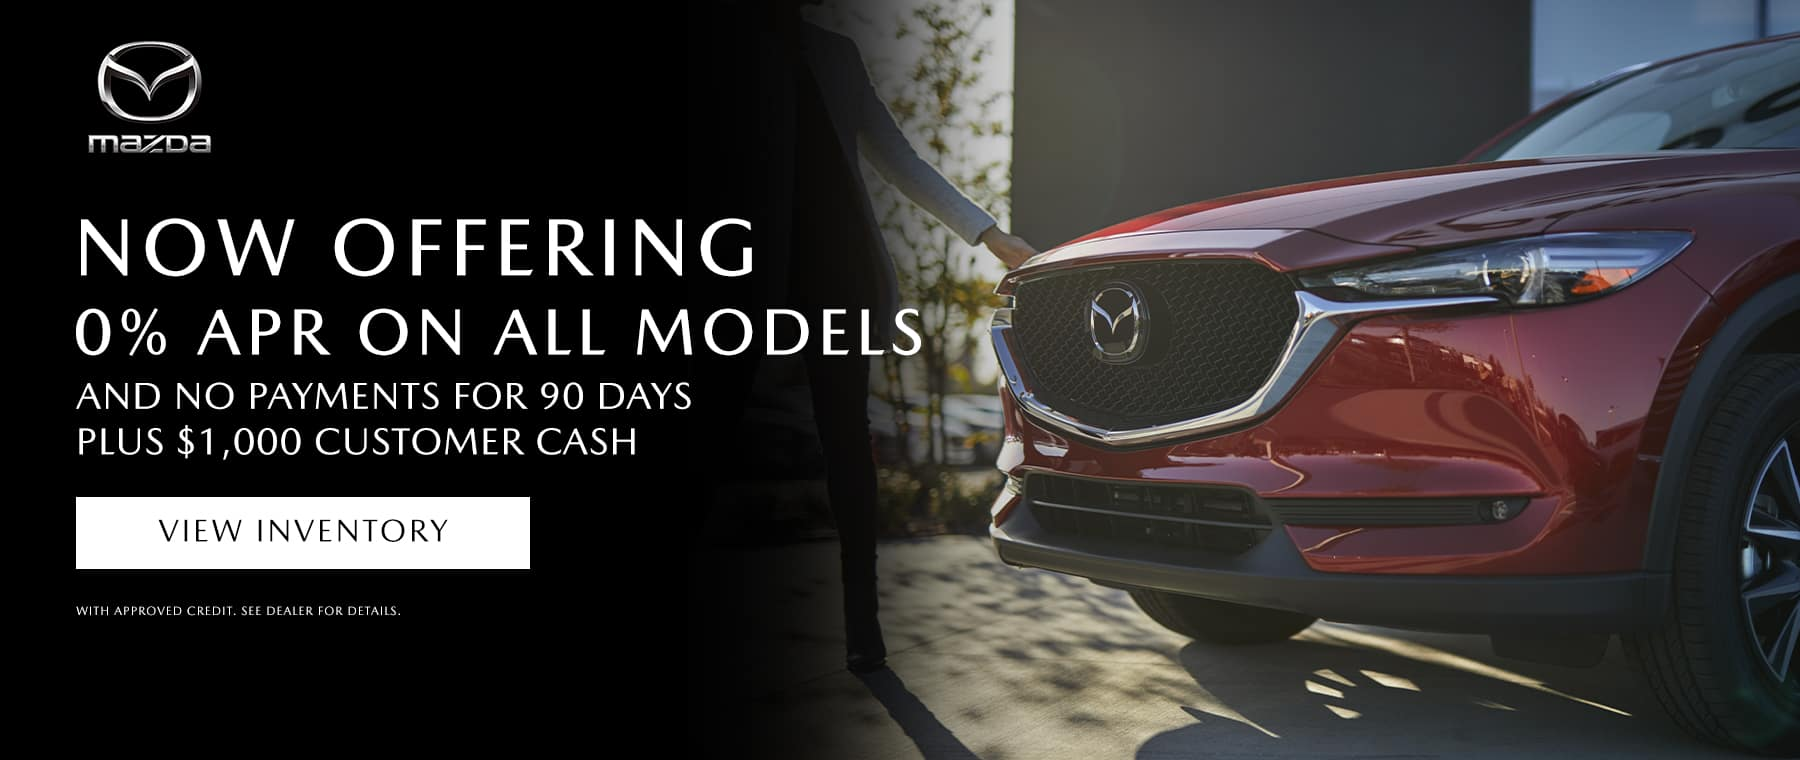 Mazda_No_Payments_0%_APR